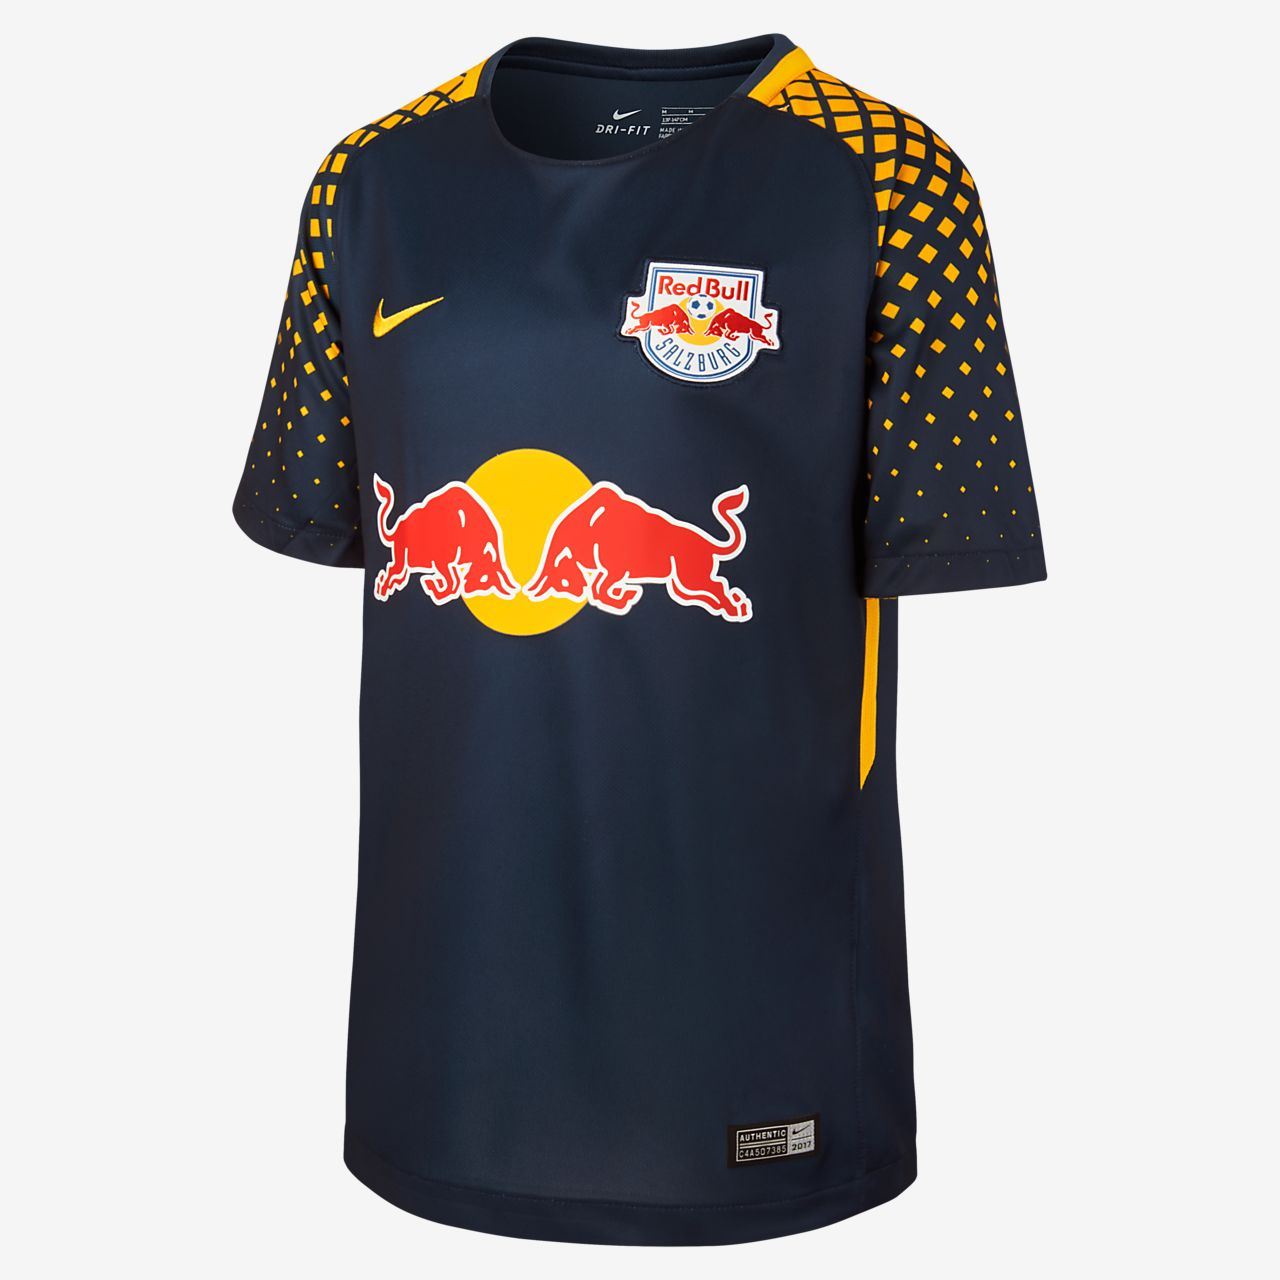 2017 18 FC RB Salzburg Stadium Home Away Camiseta de fútbol - Niño a ... d8eaaf17525